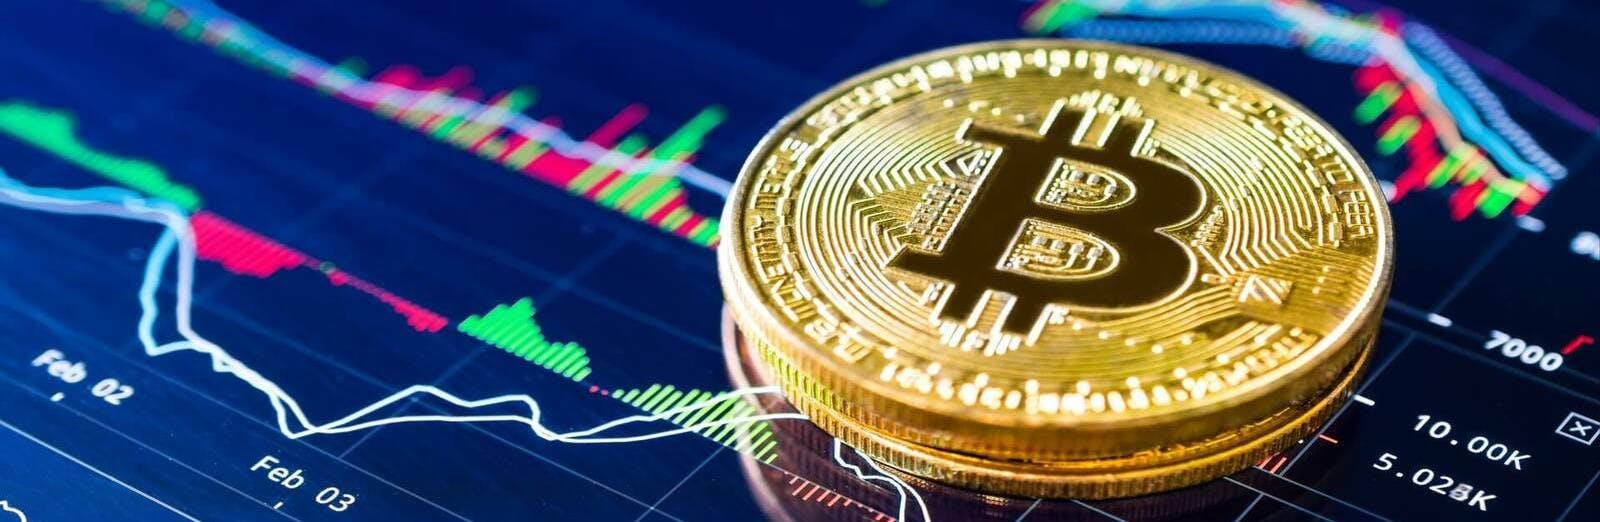 crypto-bitcoin.jpg